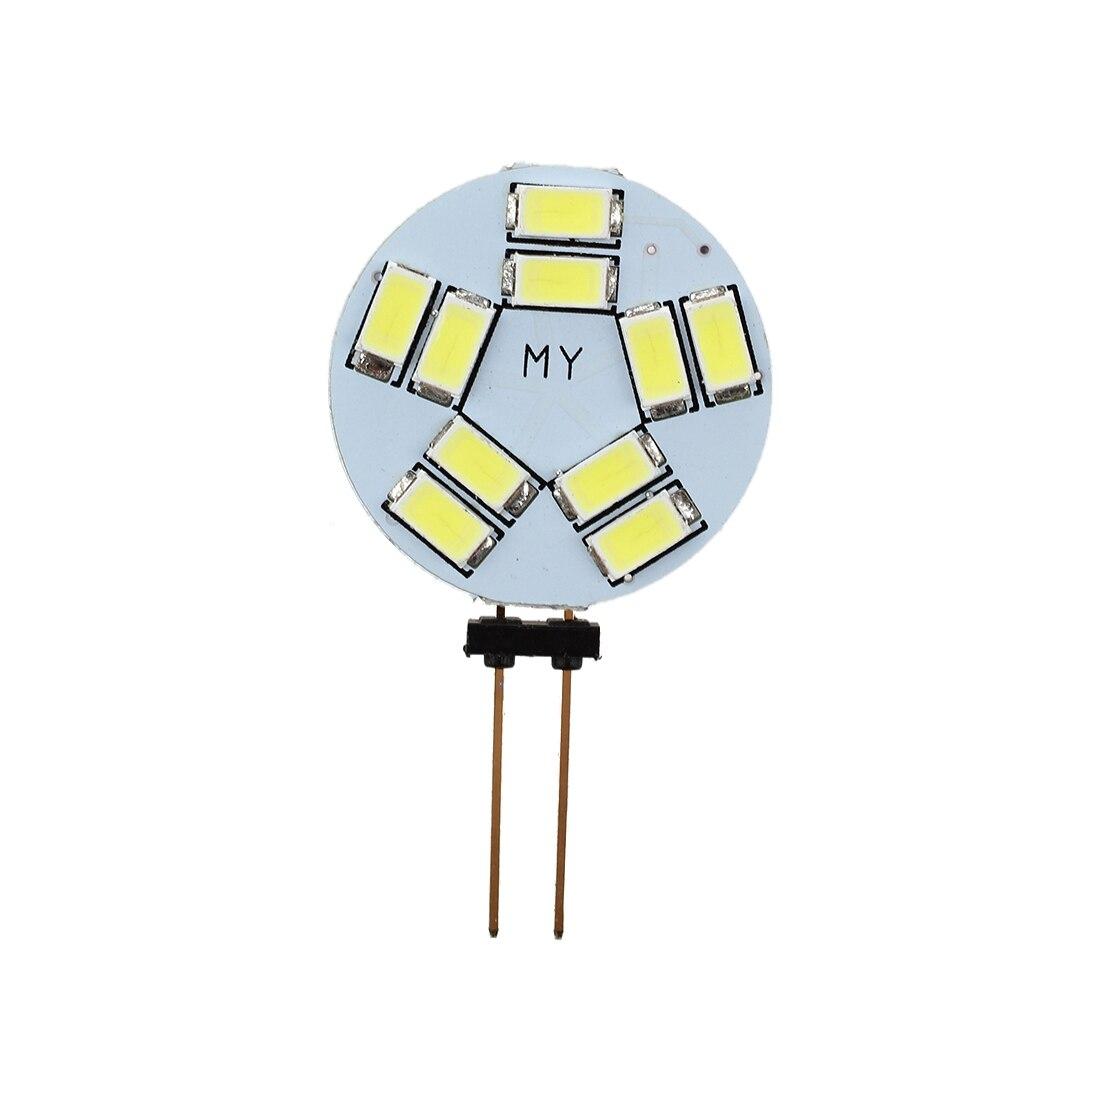 TOYL G4 10 5630SMD LED Cabinet Light Home Car Marine Boat Lamp Bulb 12V (White)